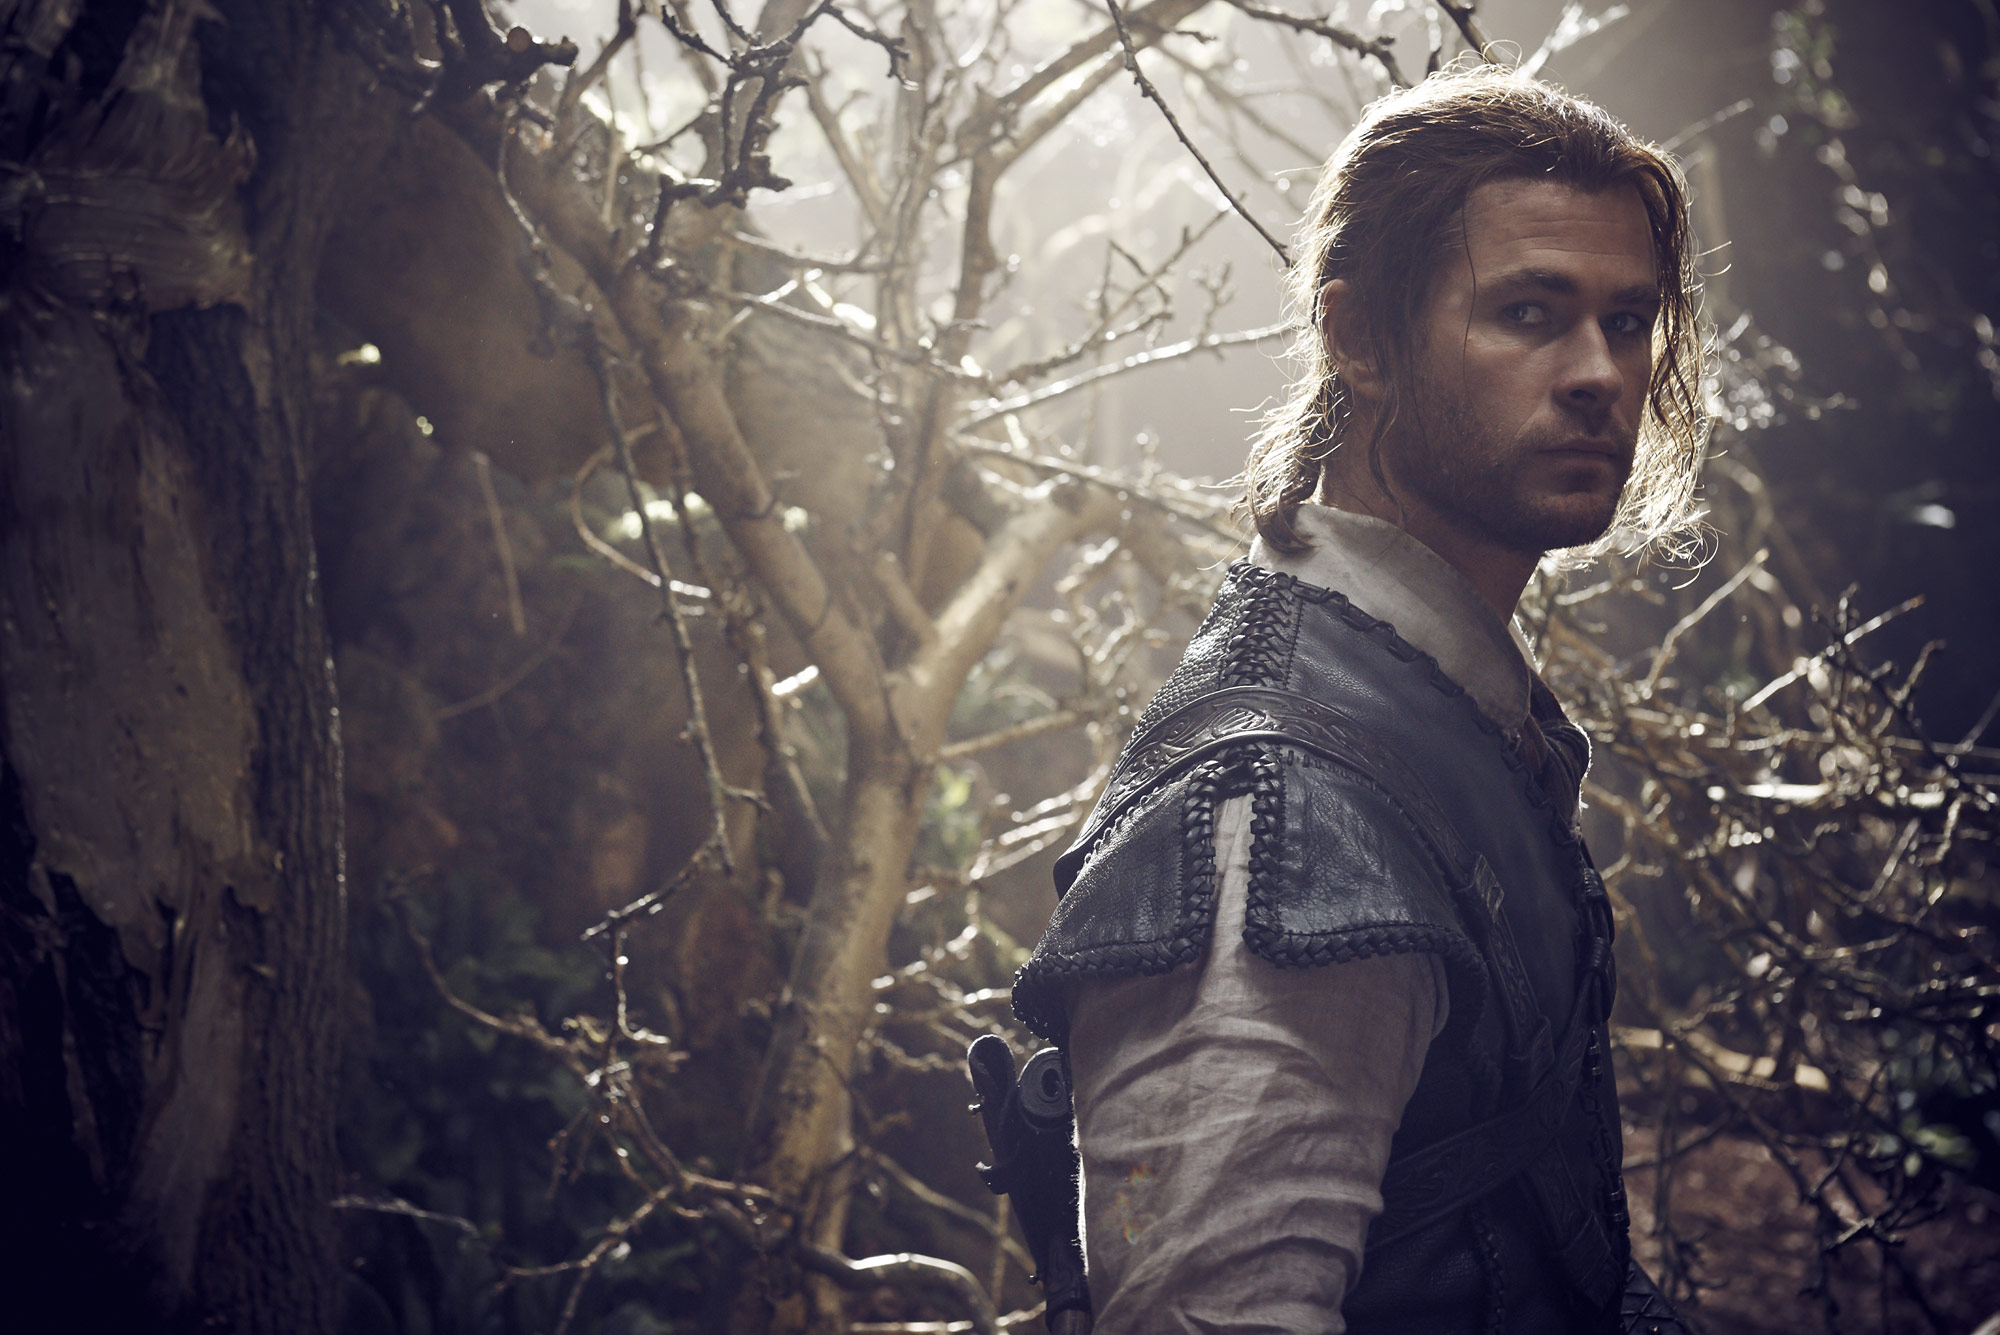 Chris Hemsworth on set of The Huntsman